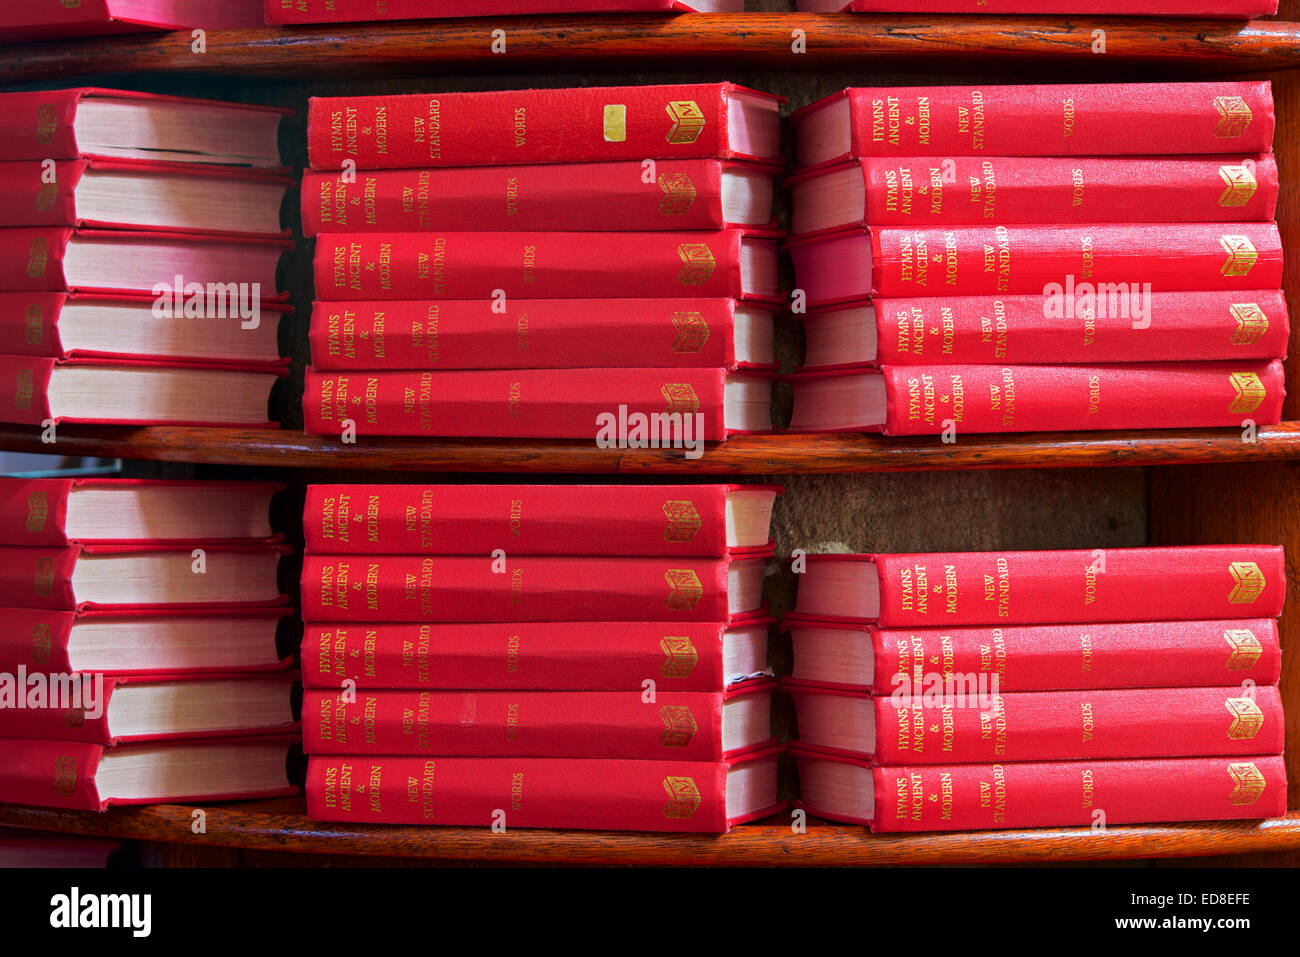 Pile of hymn books in church, England UK Stock Photo: 77019026 - Alamy